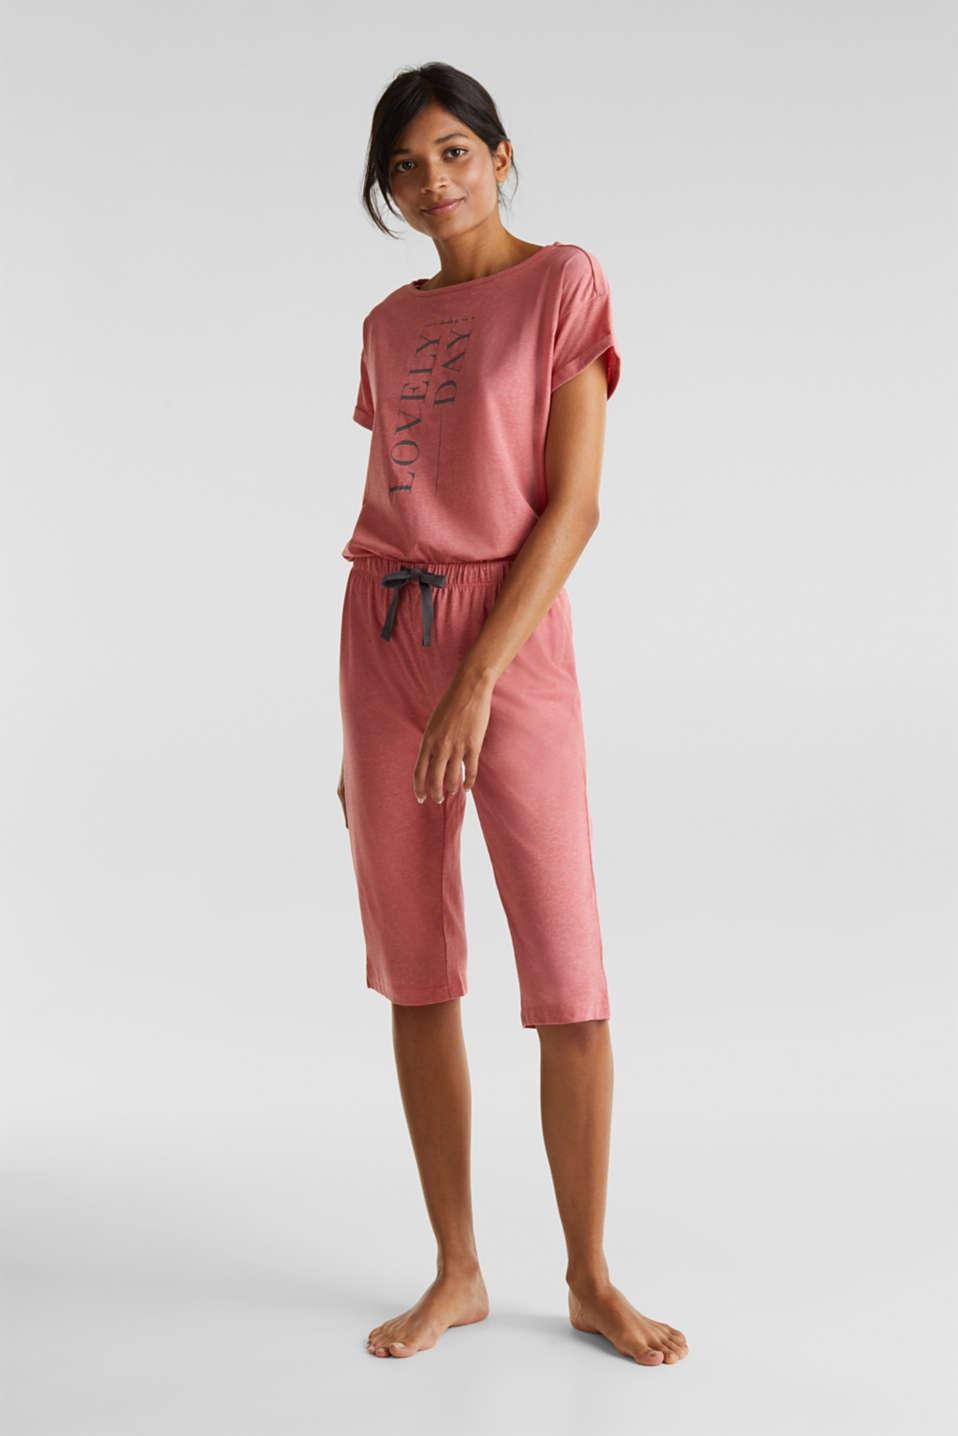 Blended cotton jersey pyjamas, CORAL RED, detail image number 1